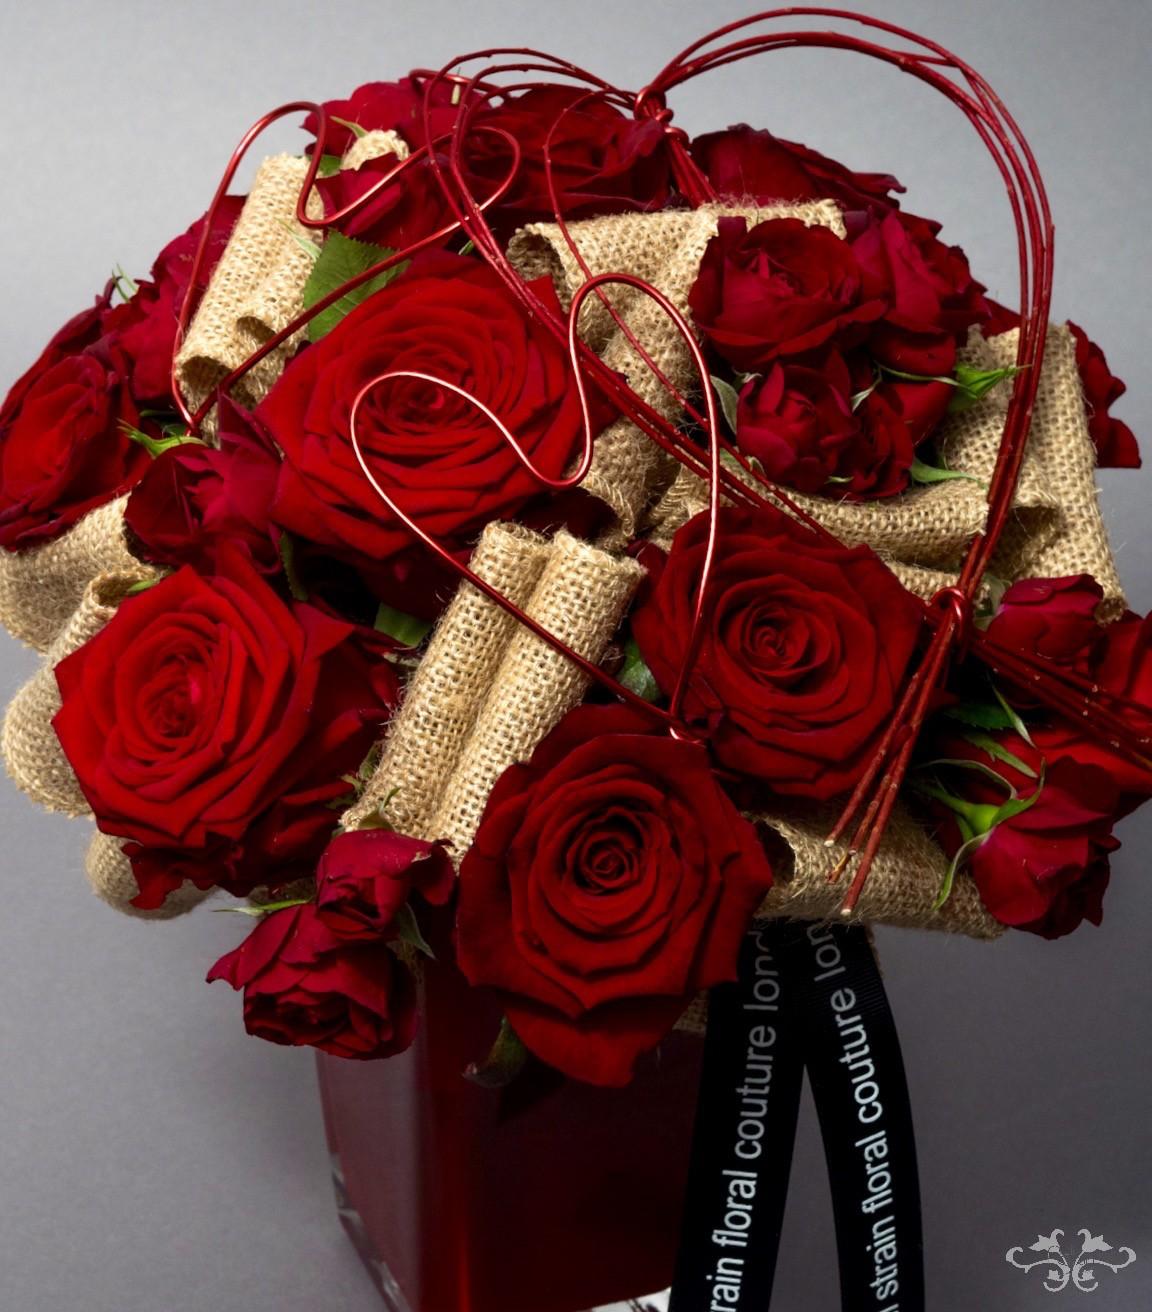 Neill Strain Valentines petite couture.jpg